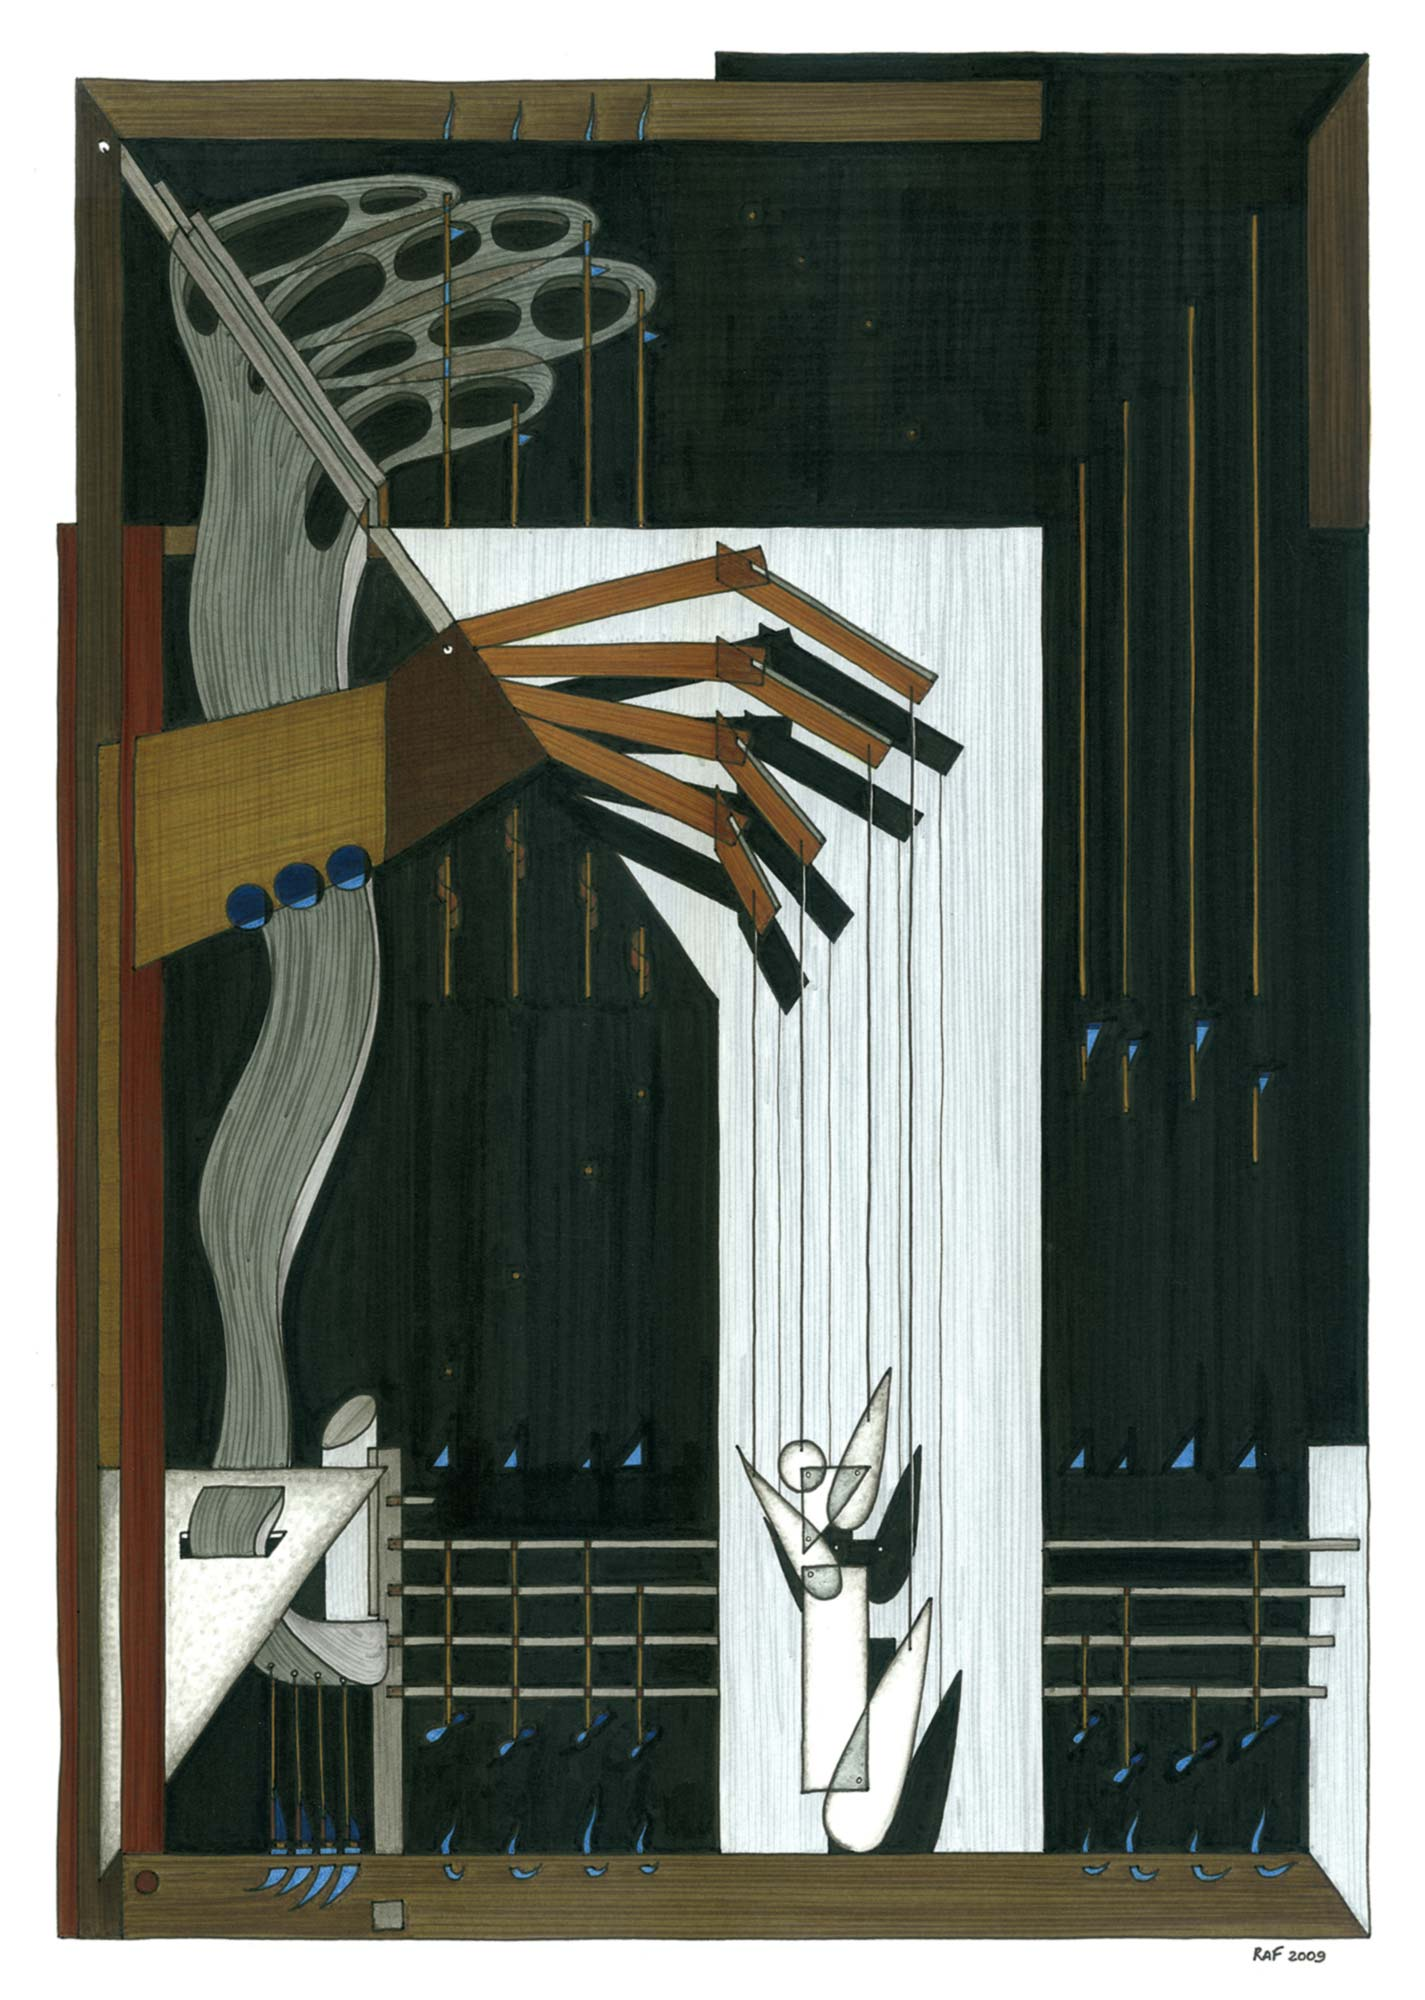 La manipulation, dessin, Raf Listowski, 2009